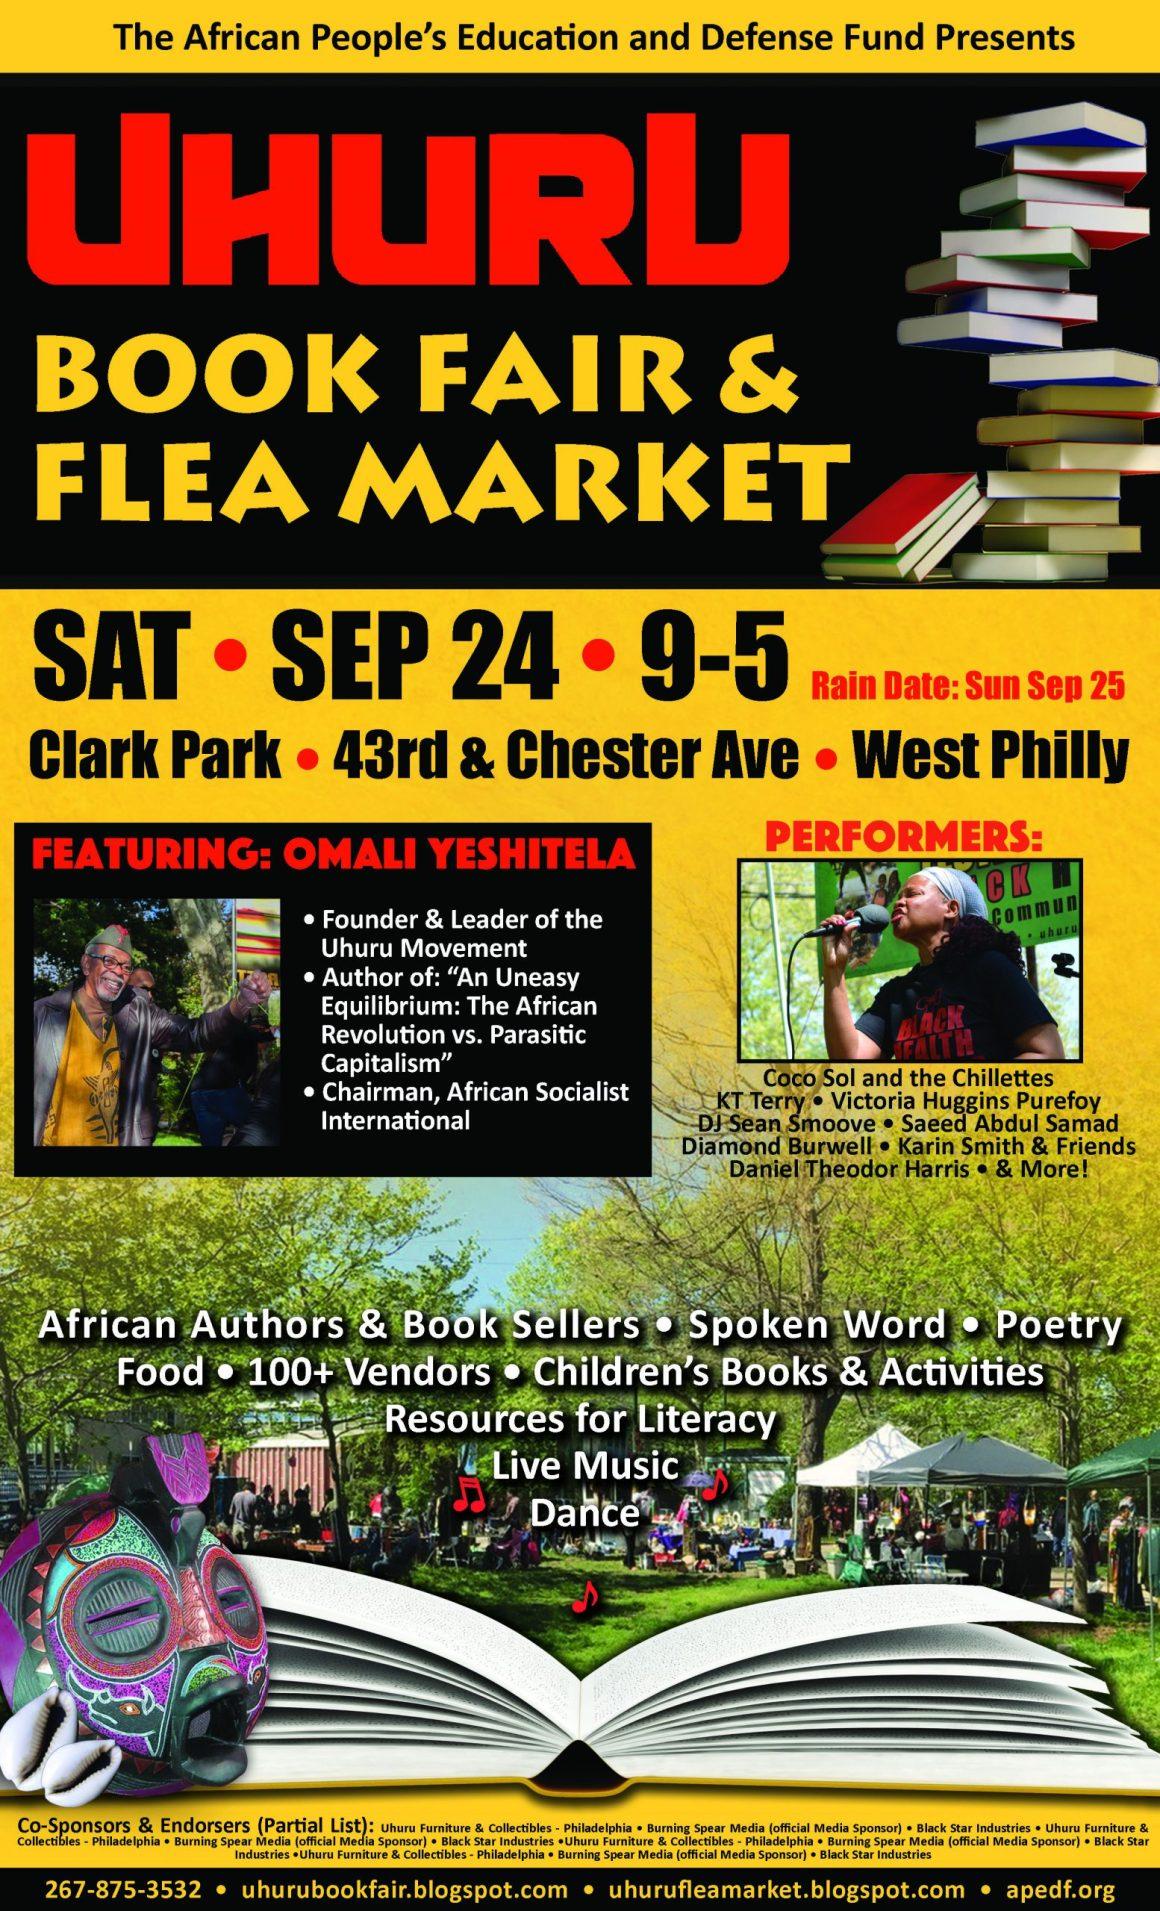 Uhuru Book Fair and Flea Market